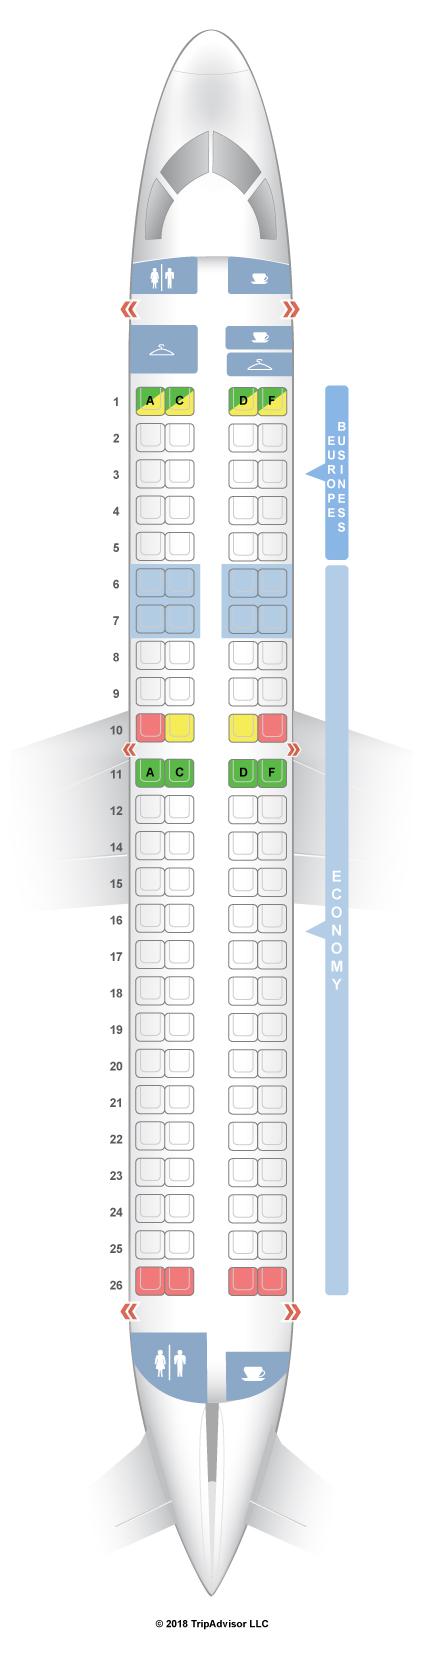 Seatguru Seat Map Klm Embraer E